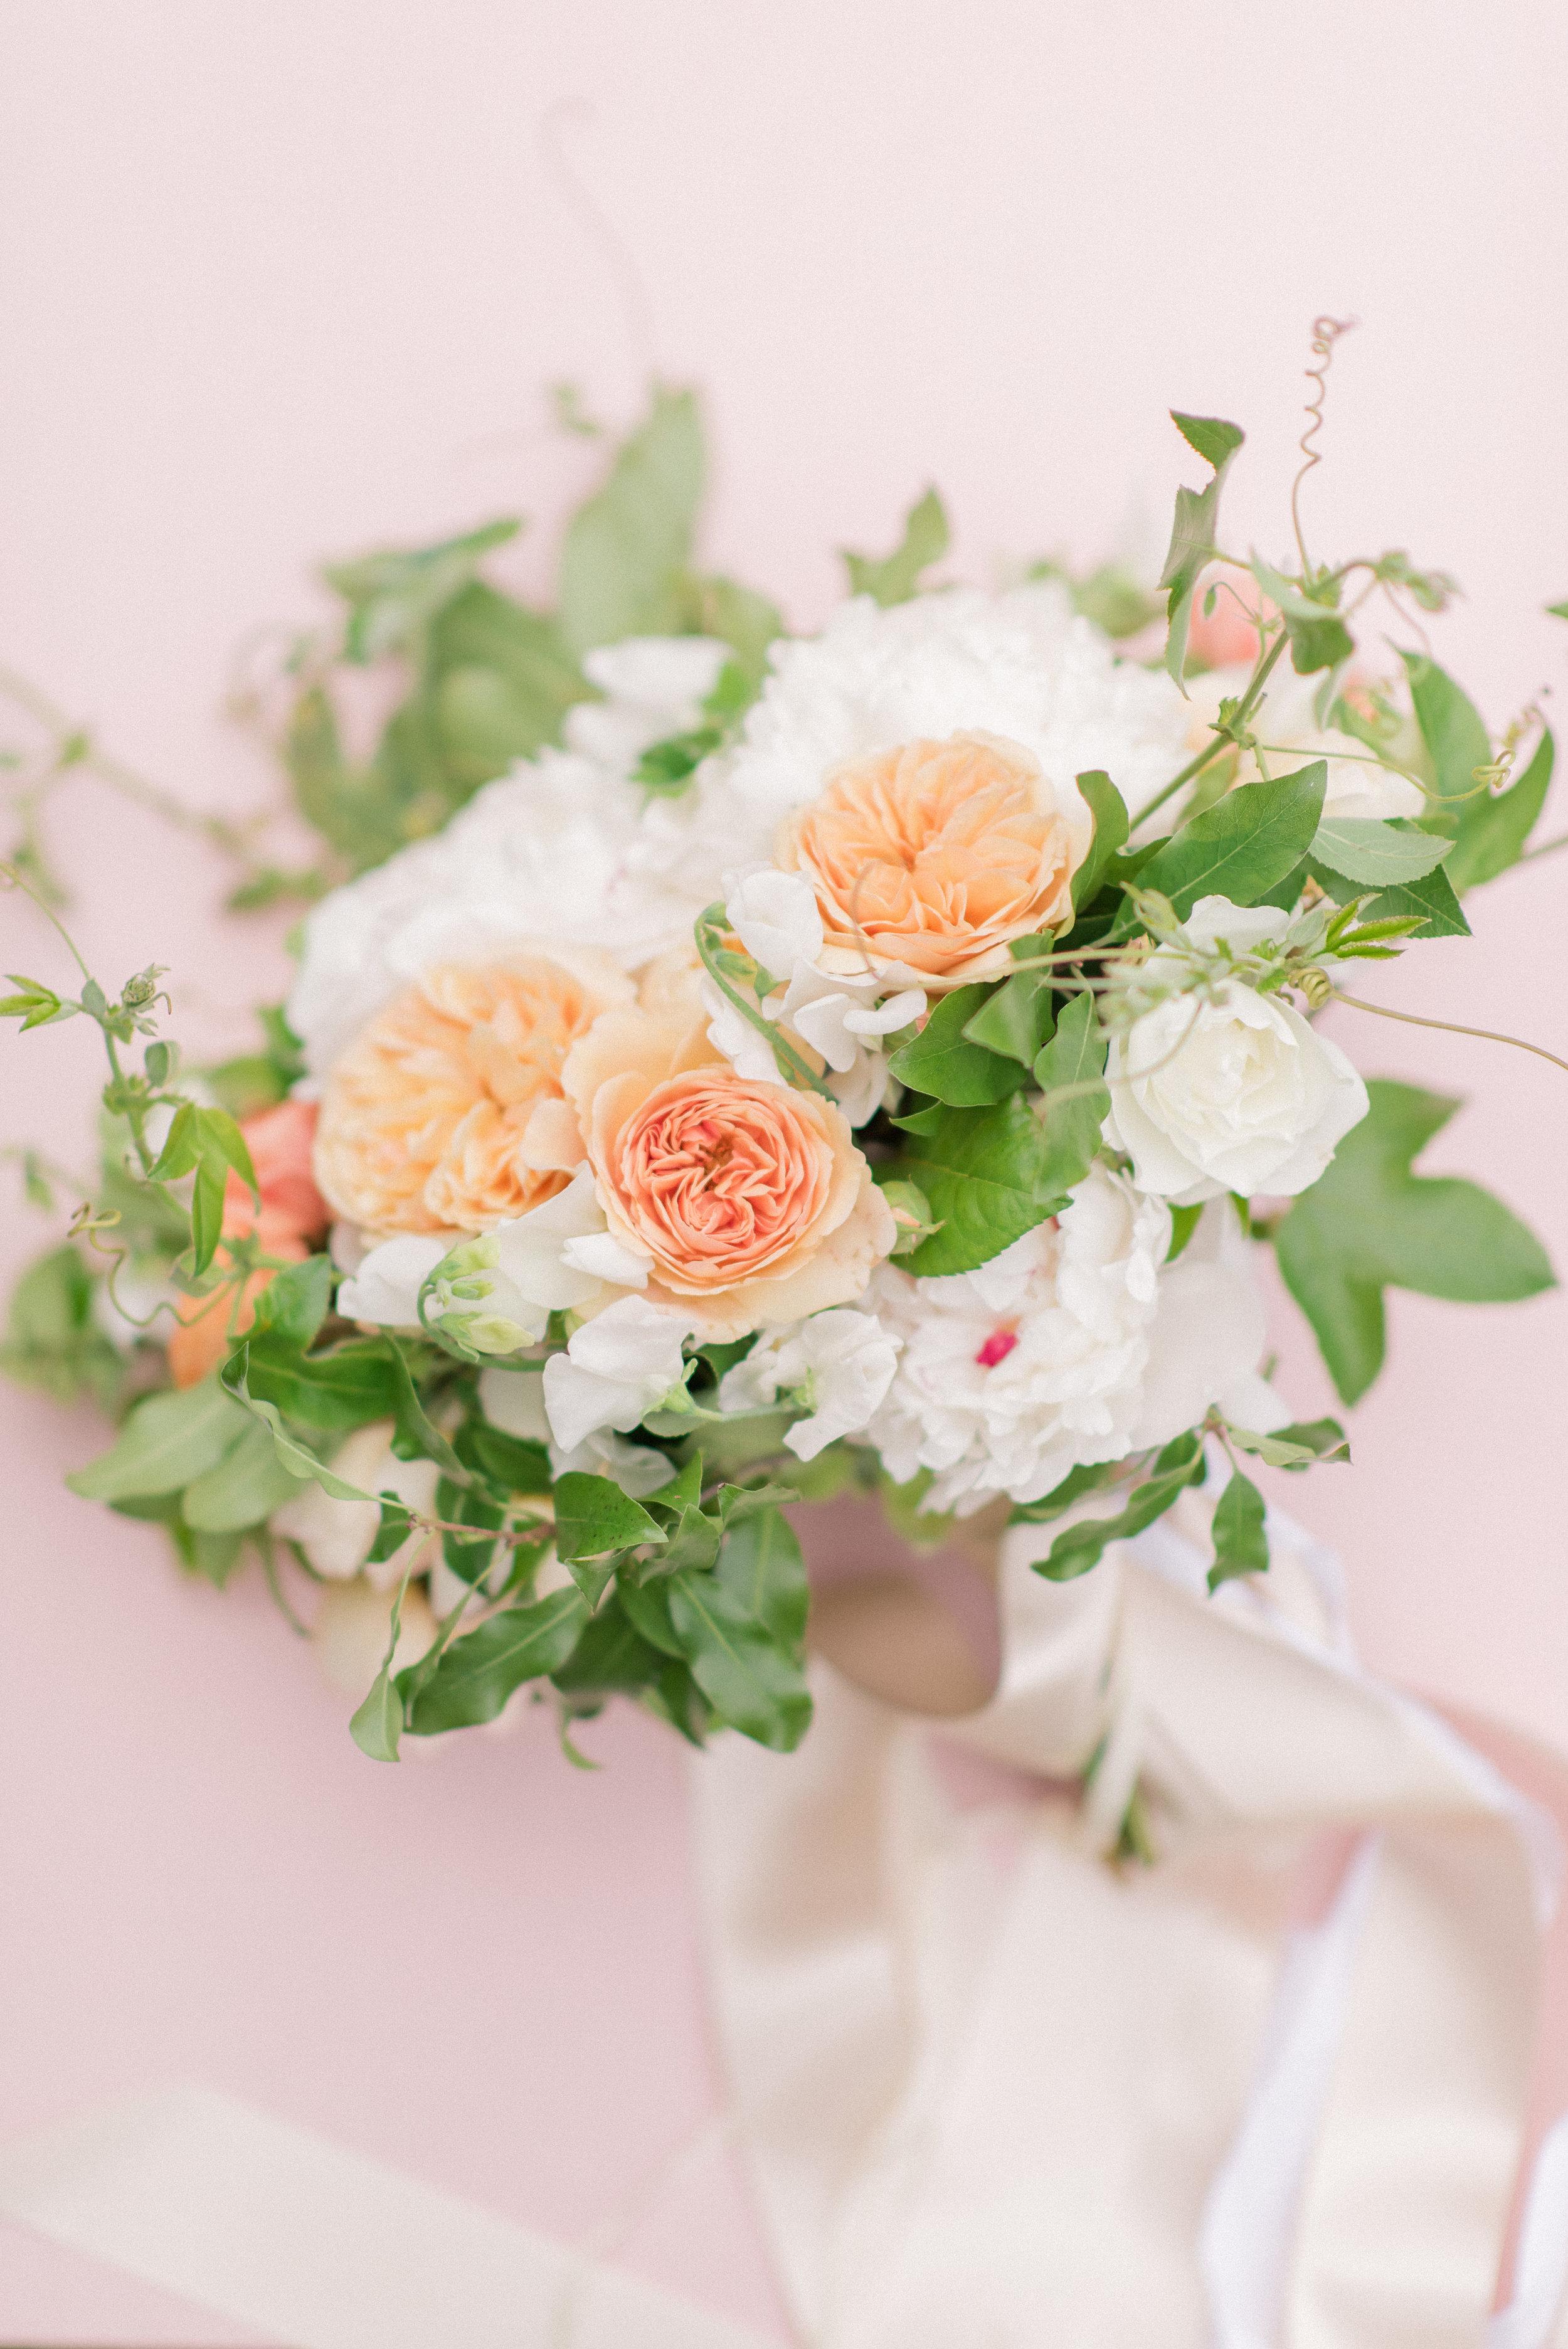 california-wedding-day-lrelyea-events-lori-paladino-photography8.jpg